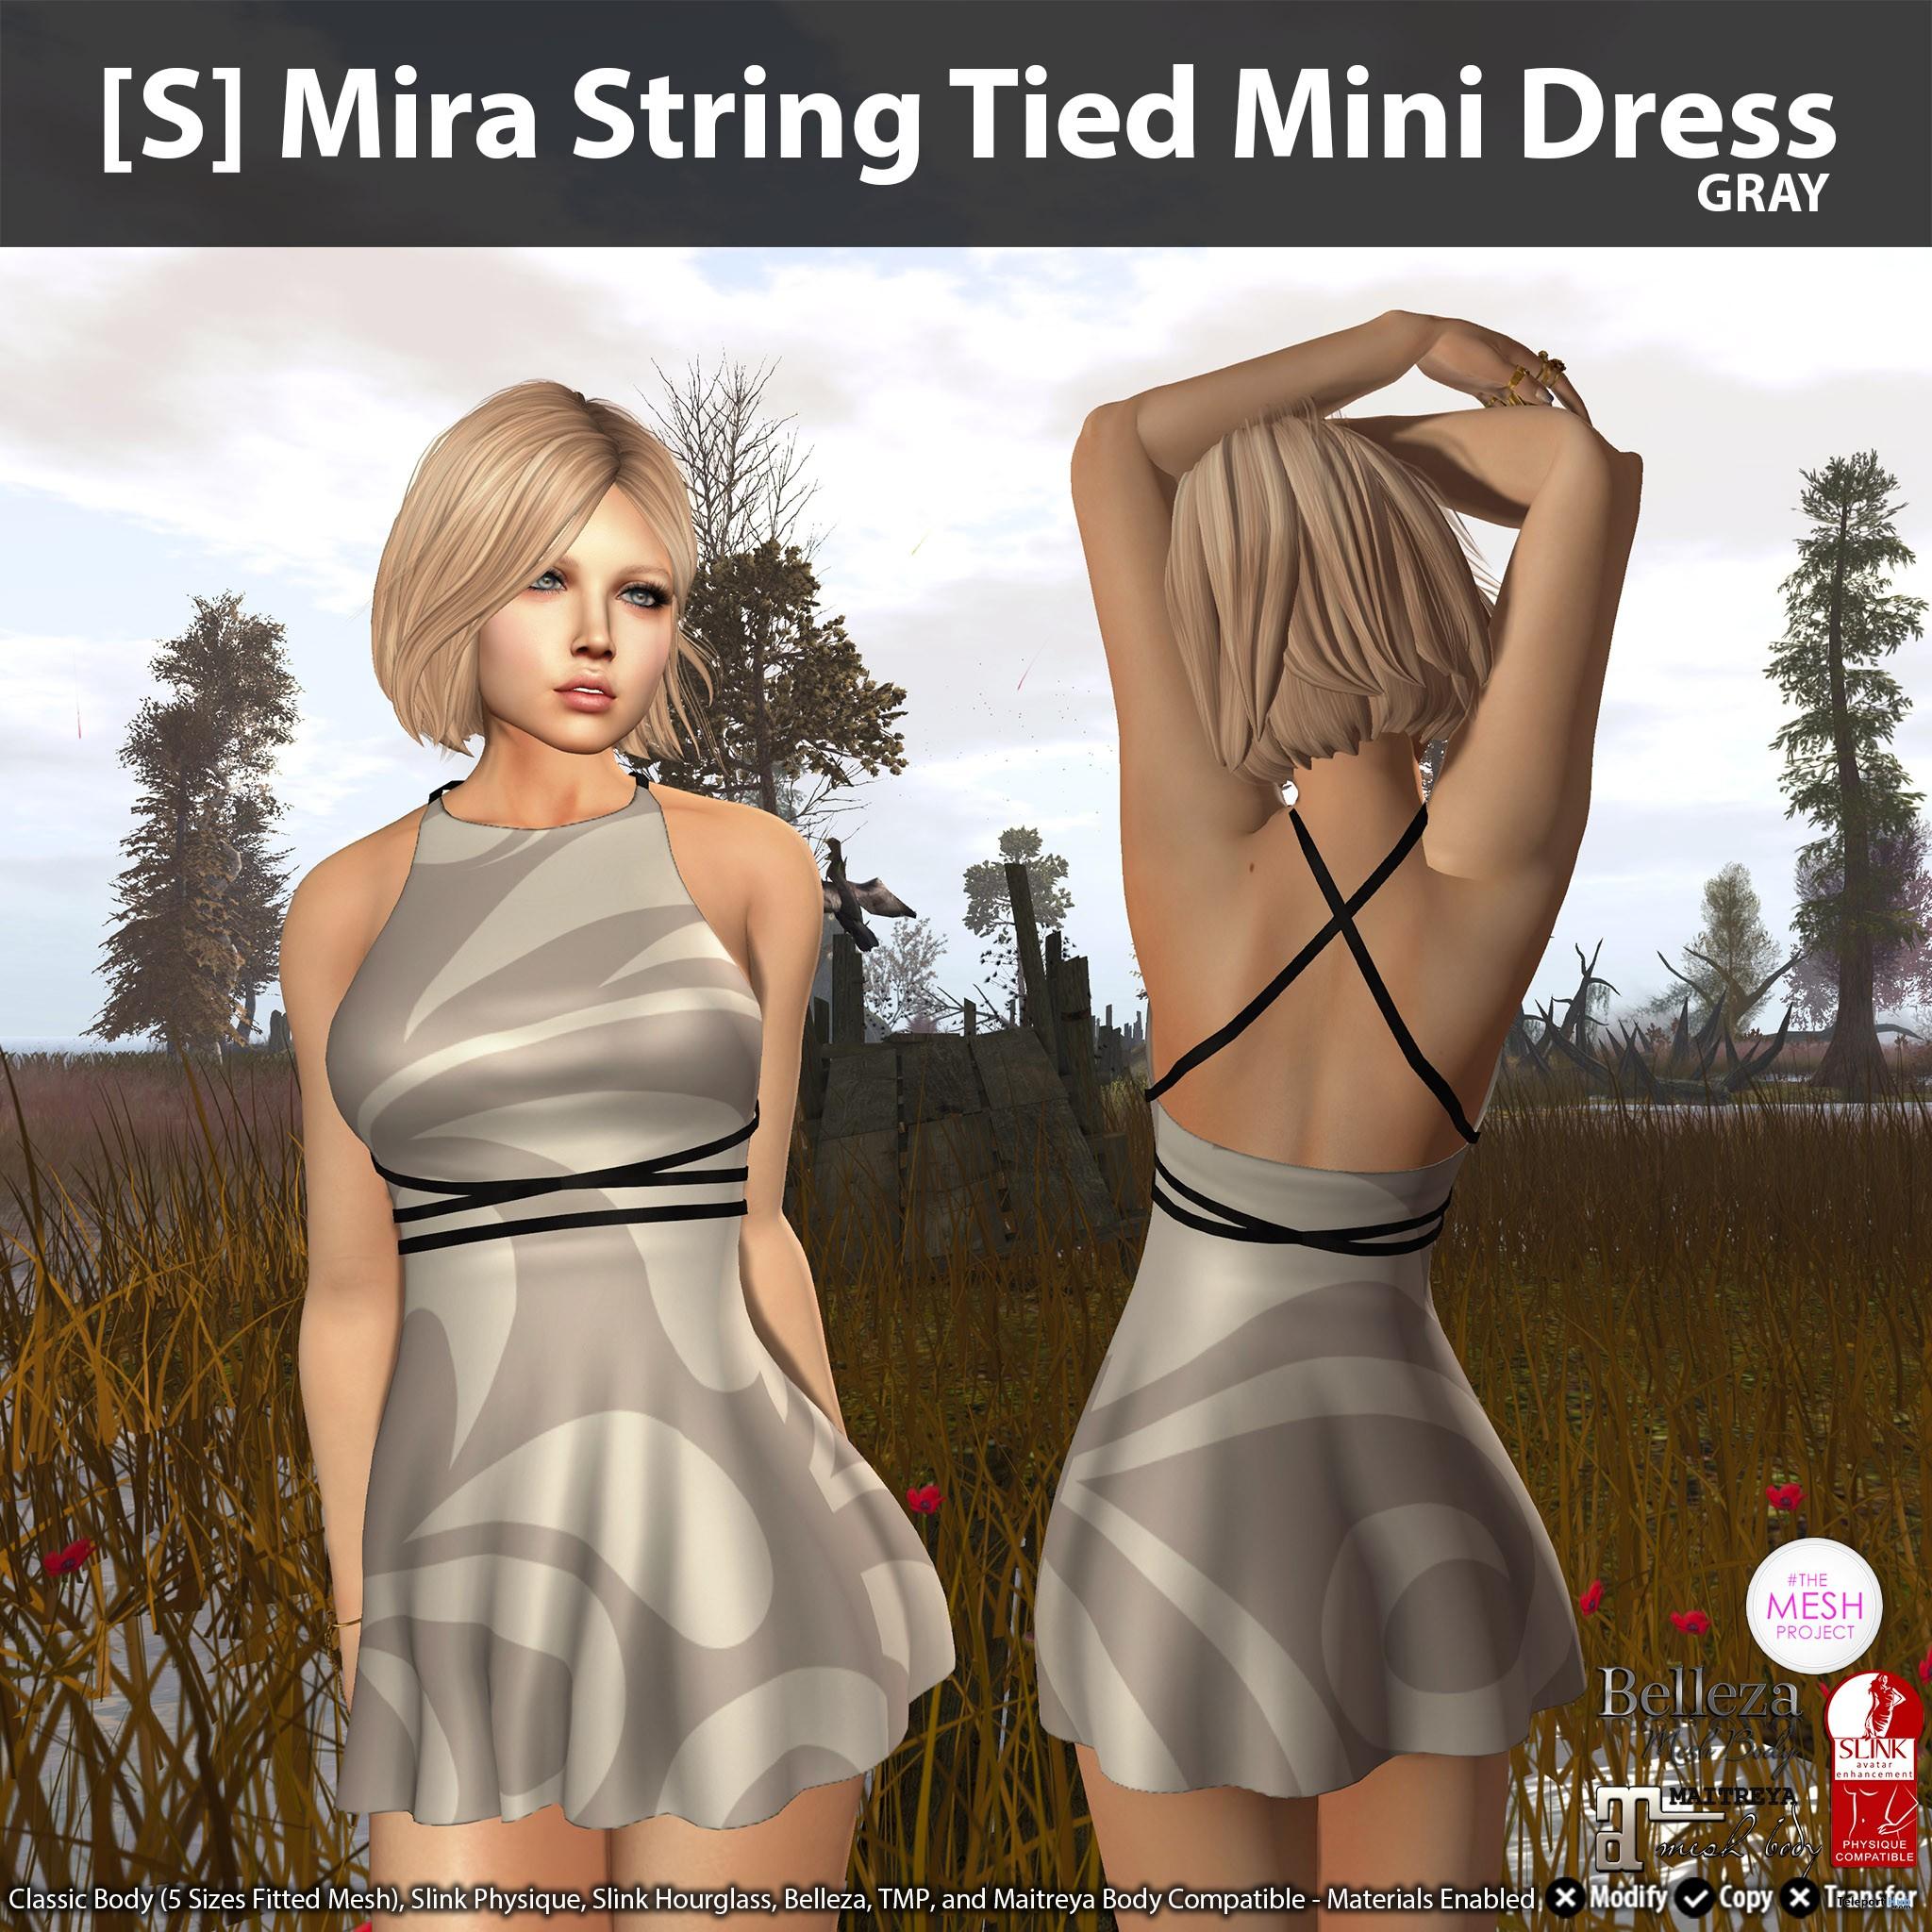 New Release: [S] Mira String Tied Mini Dress by [satus Inc] - Teleport Hub - TeleportHub.com